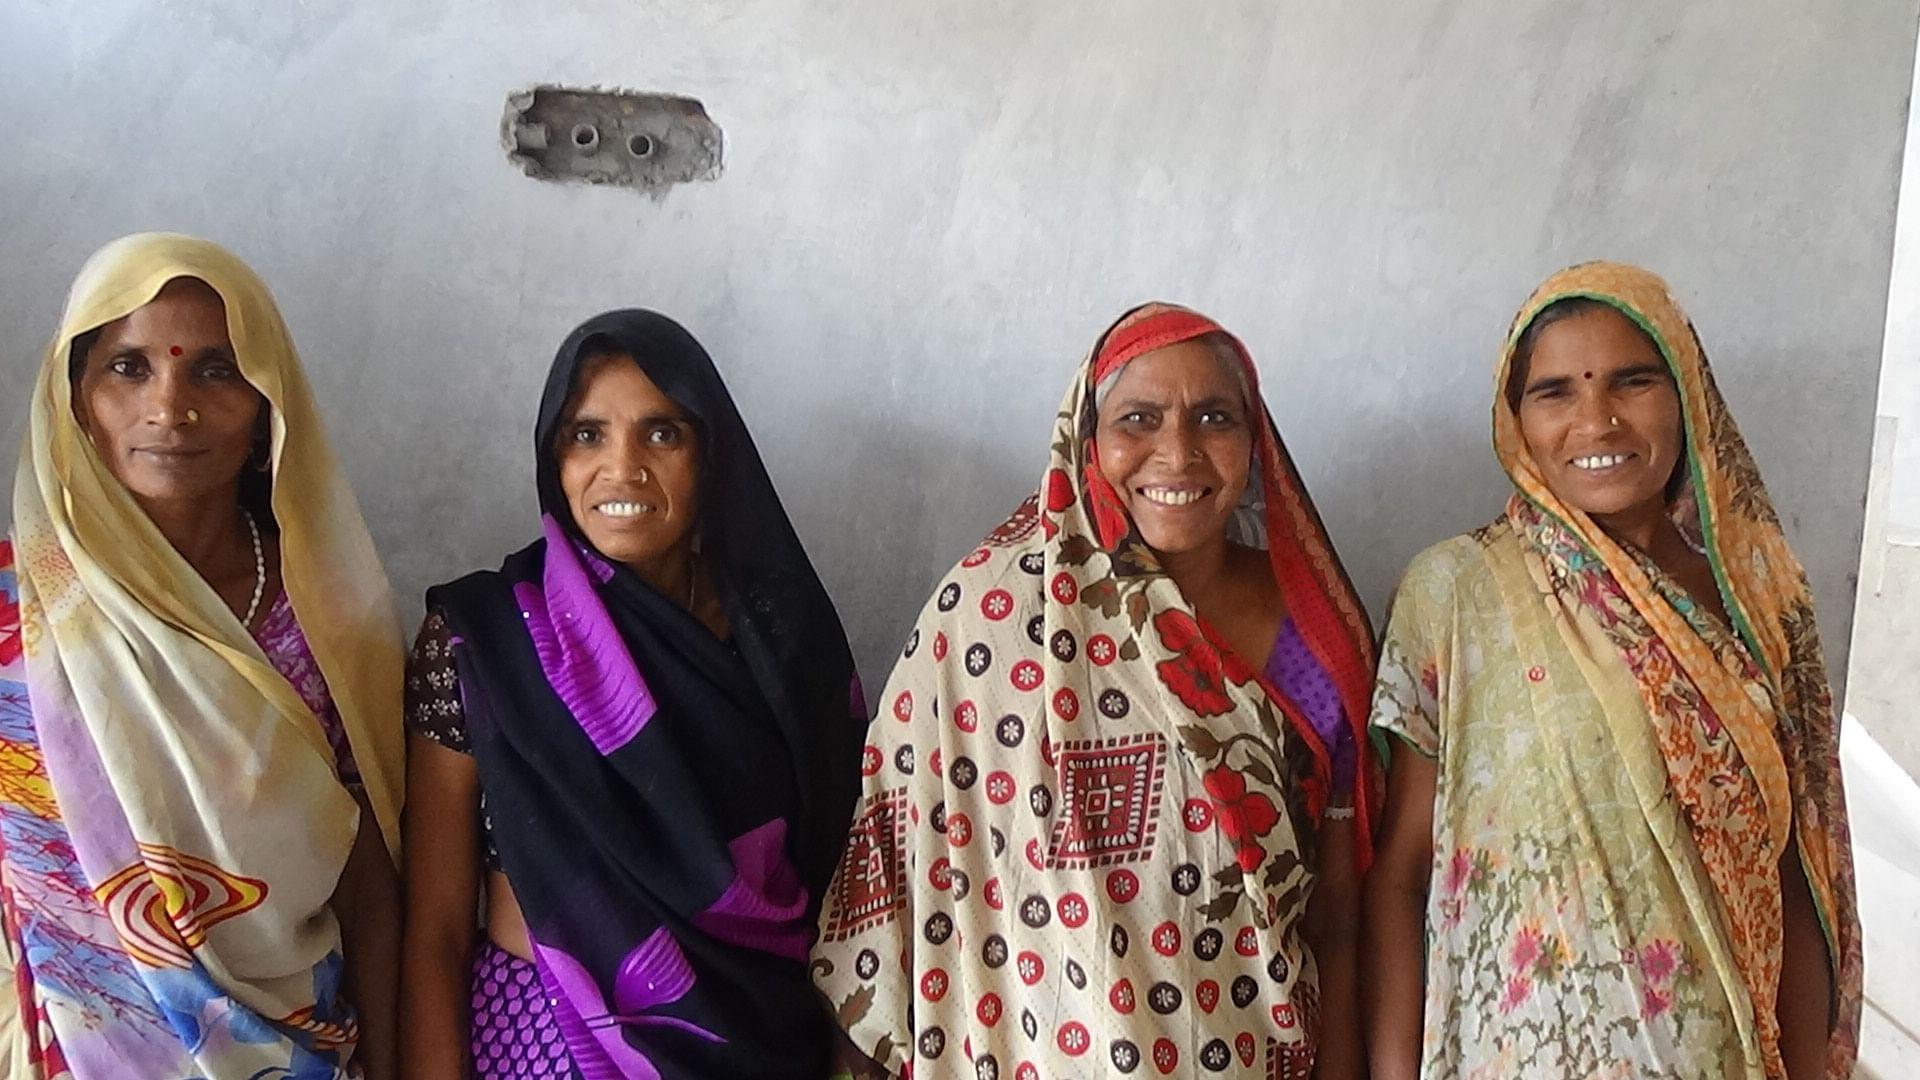 Gyanwati Devi (3rd from left) with her pardada pardadi SHG